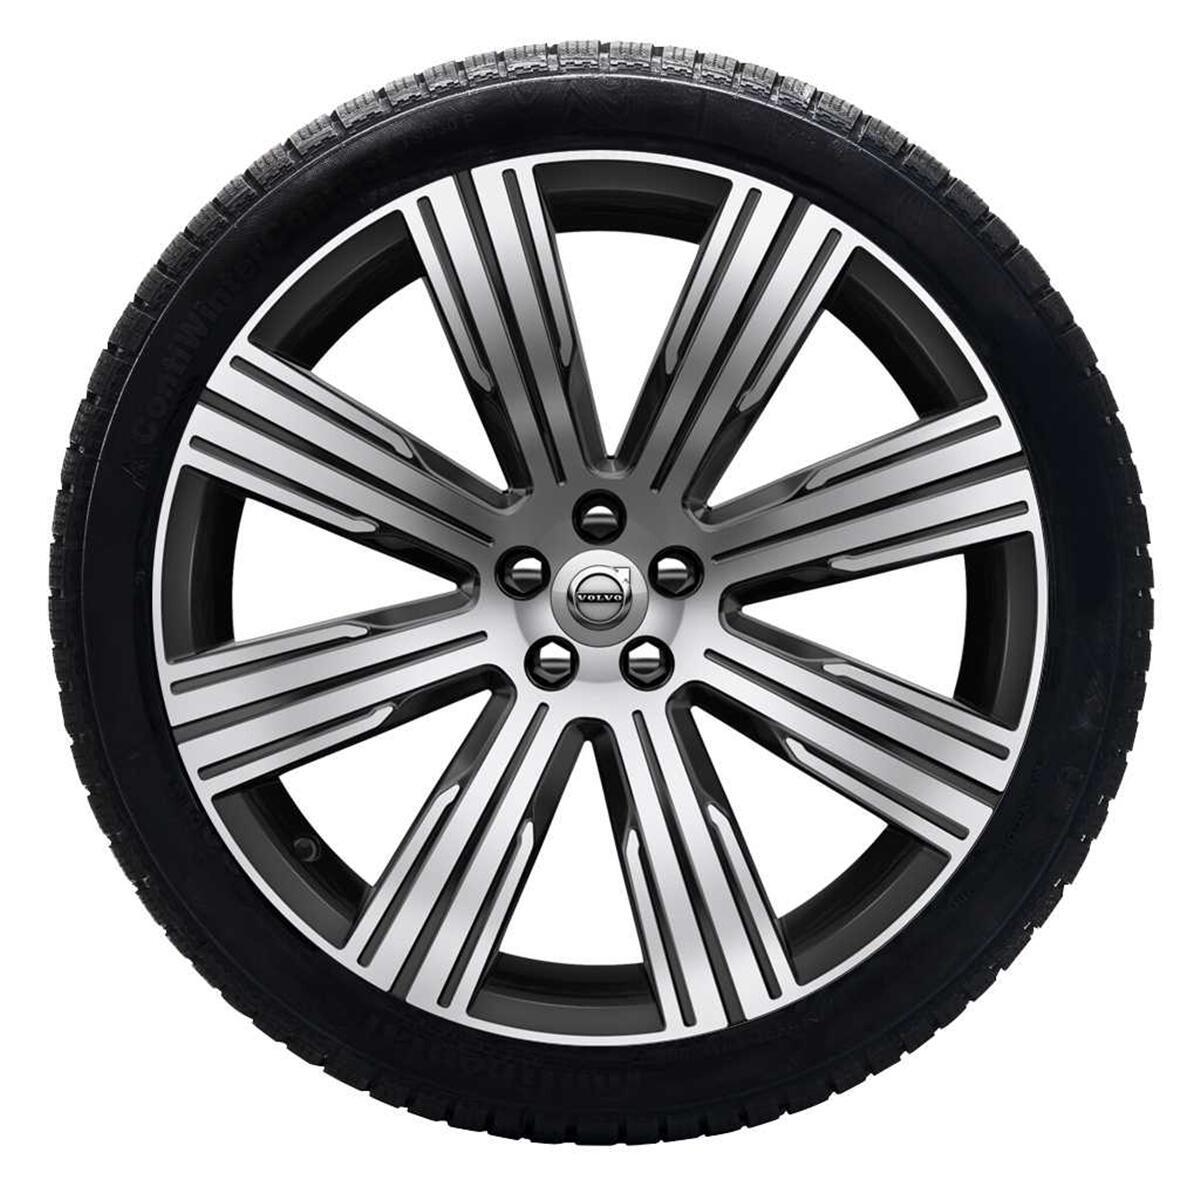 "Komplet zimskih koles: 50,08 cm (20""), pnevmatike Continental"